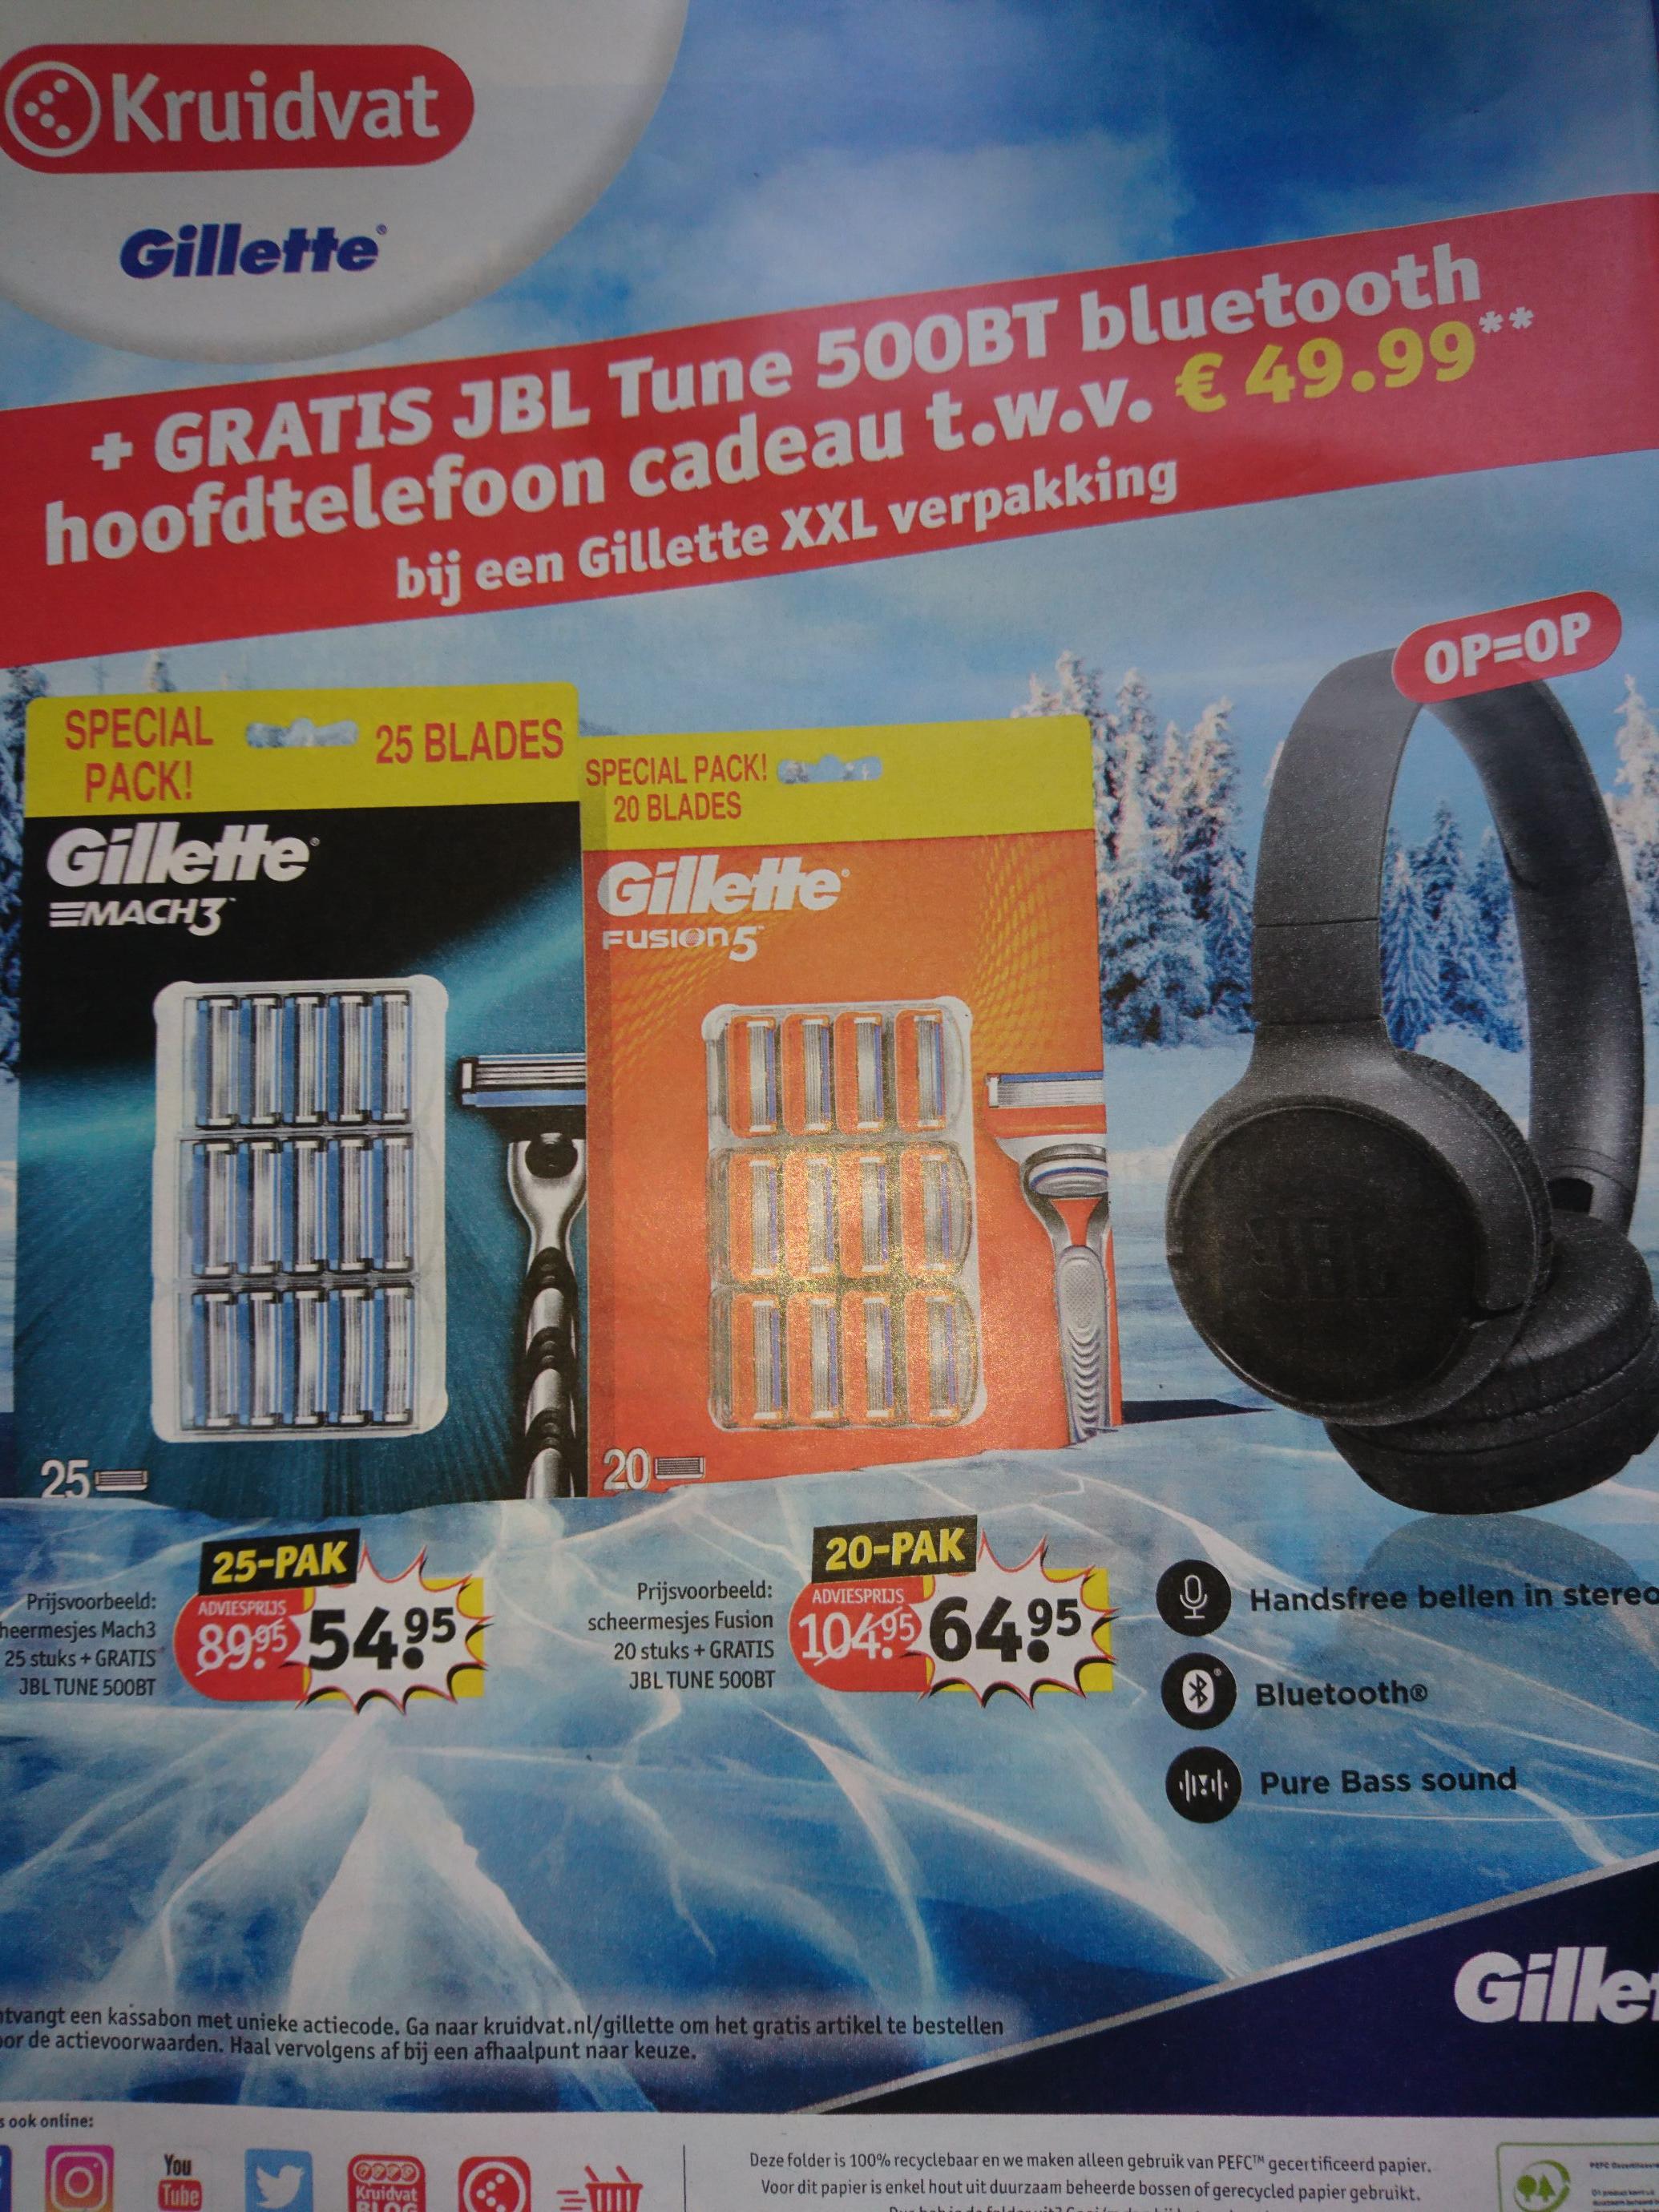 Kruidvat Gratis JBL Tune 500BT bluetooth hoofdtelefoon twv €49,99 cadeau bij Gillette